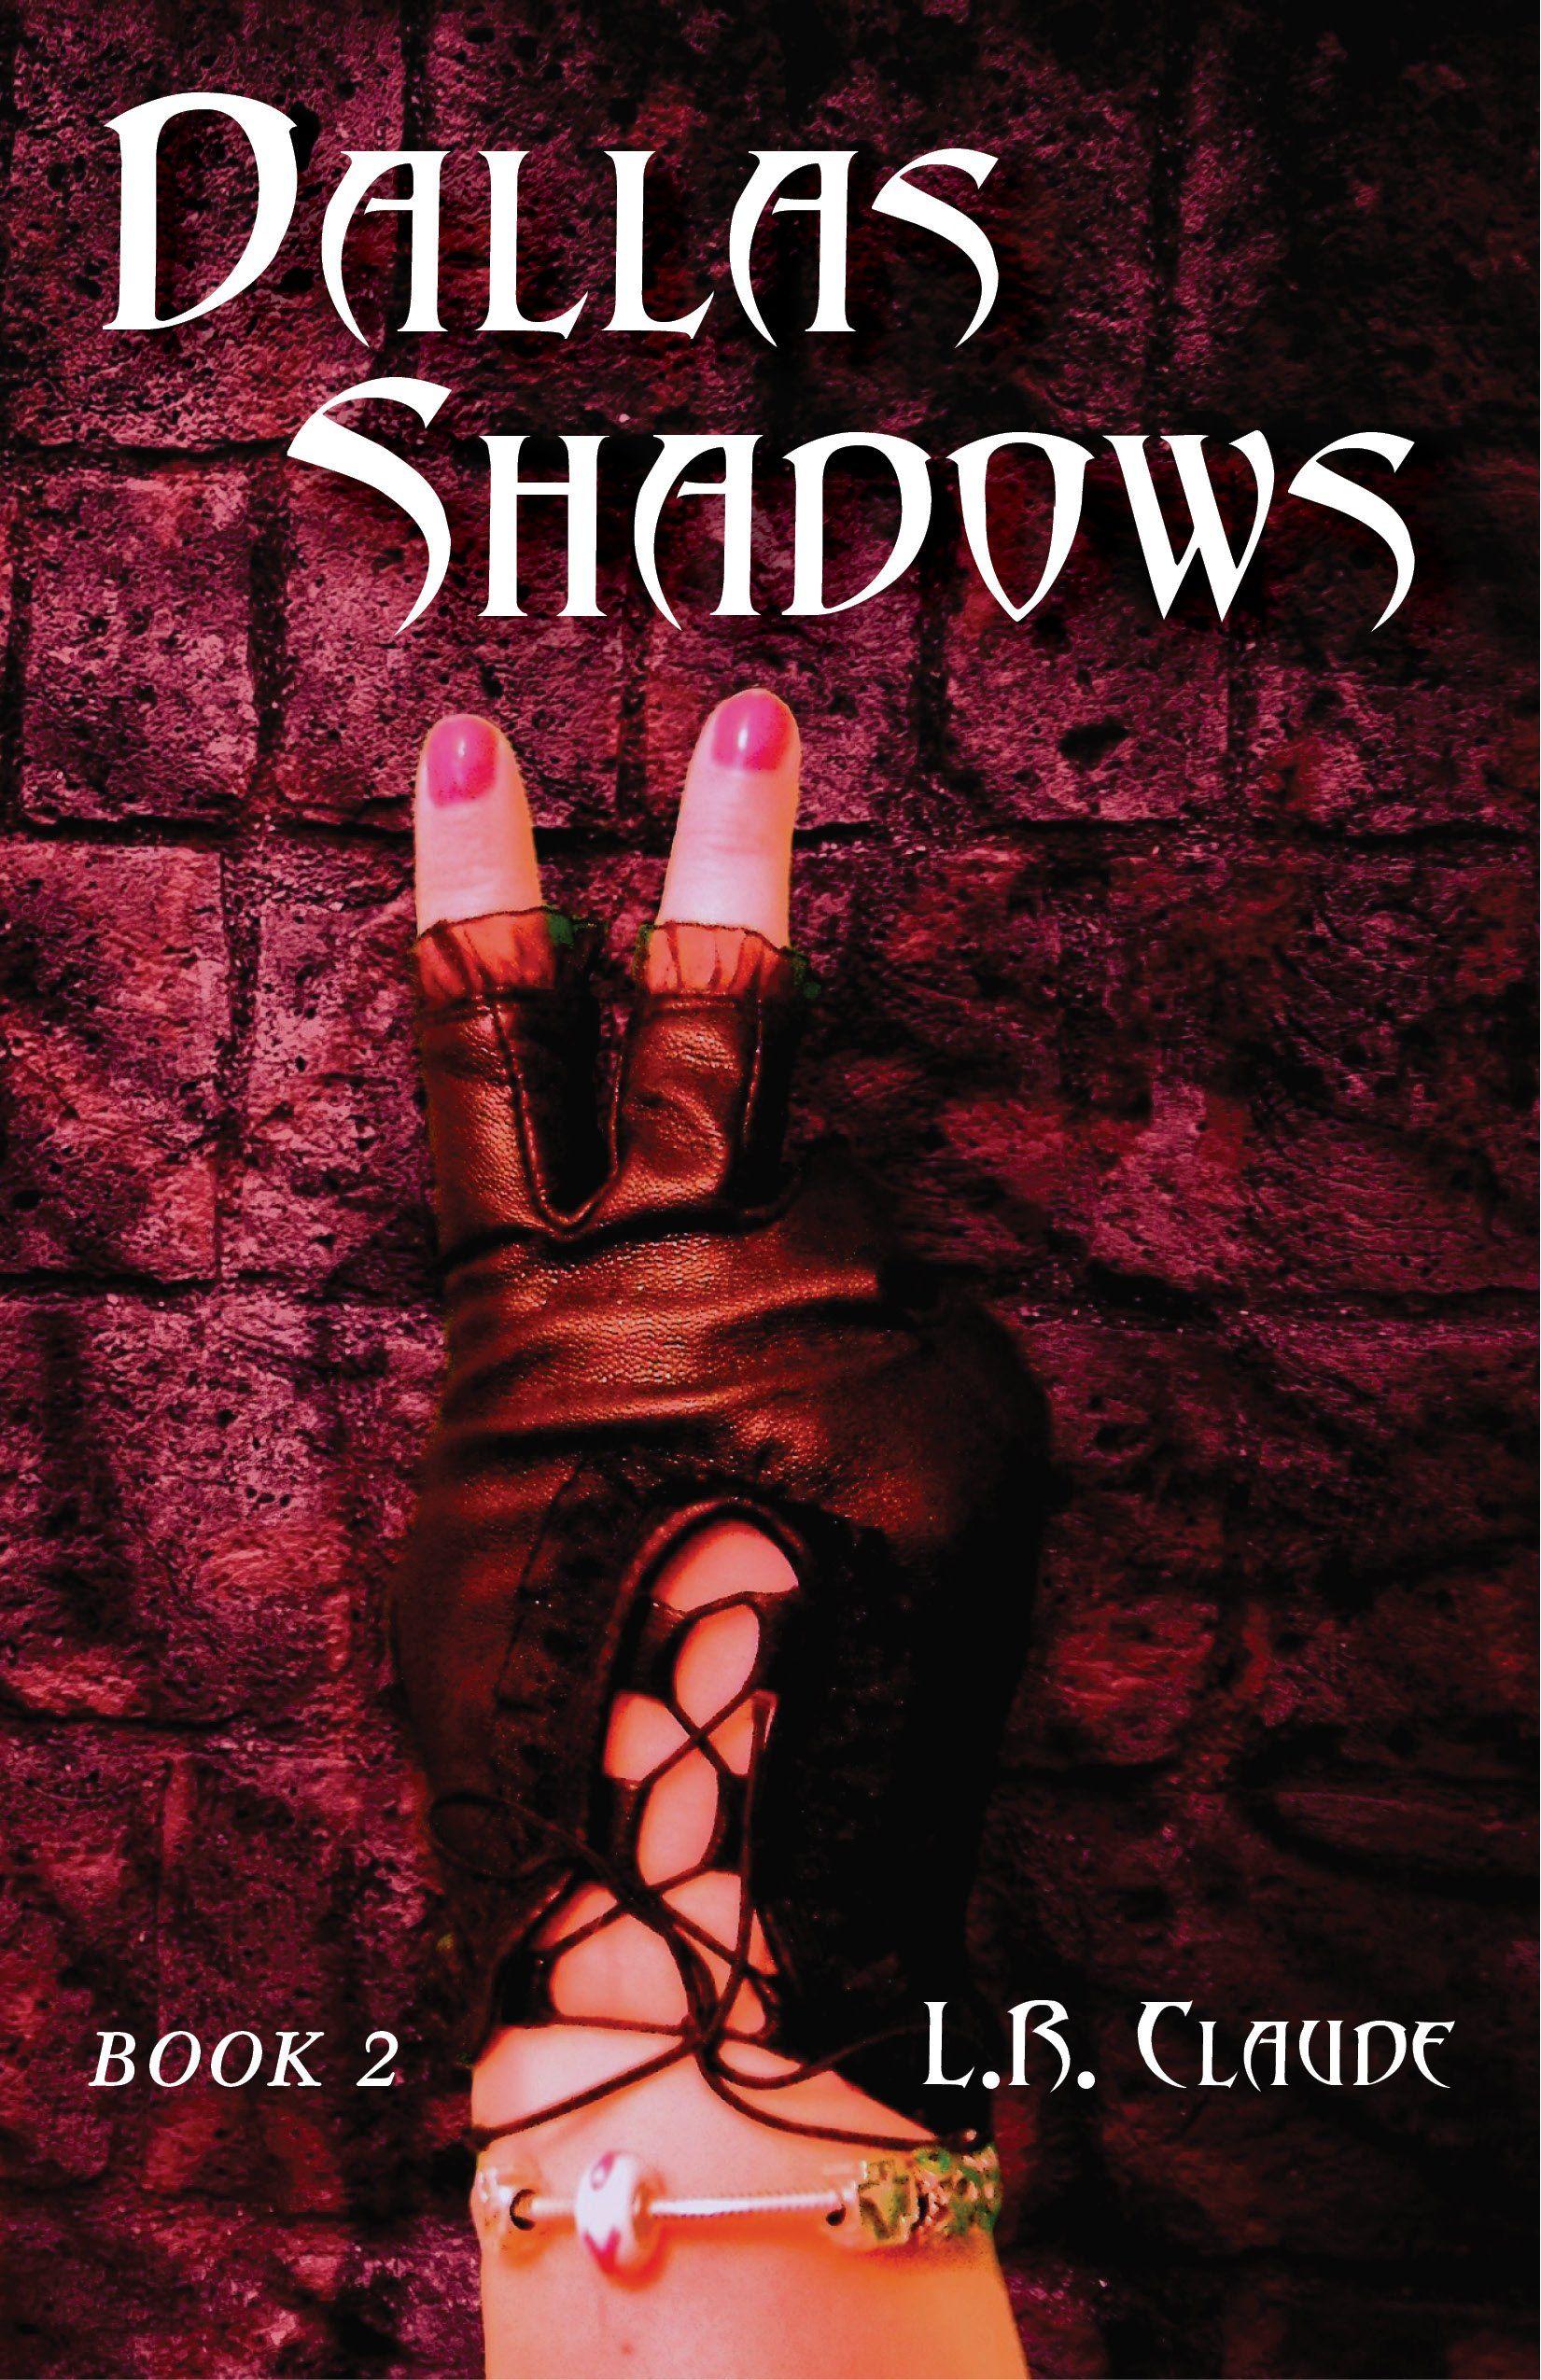 Dallas Shadows: Book 2:Amazon:Kindle Store LR Claude #CLaudeOn L.R. Claude rocks!! Amazing book Ann Arbor Michigan Author #ClaudeOn